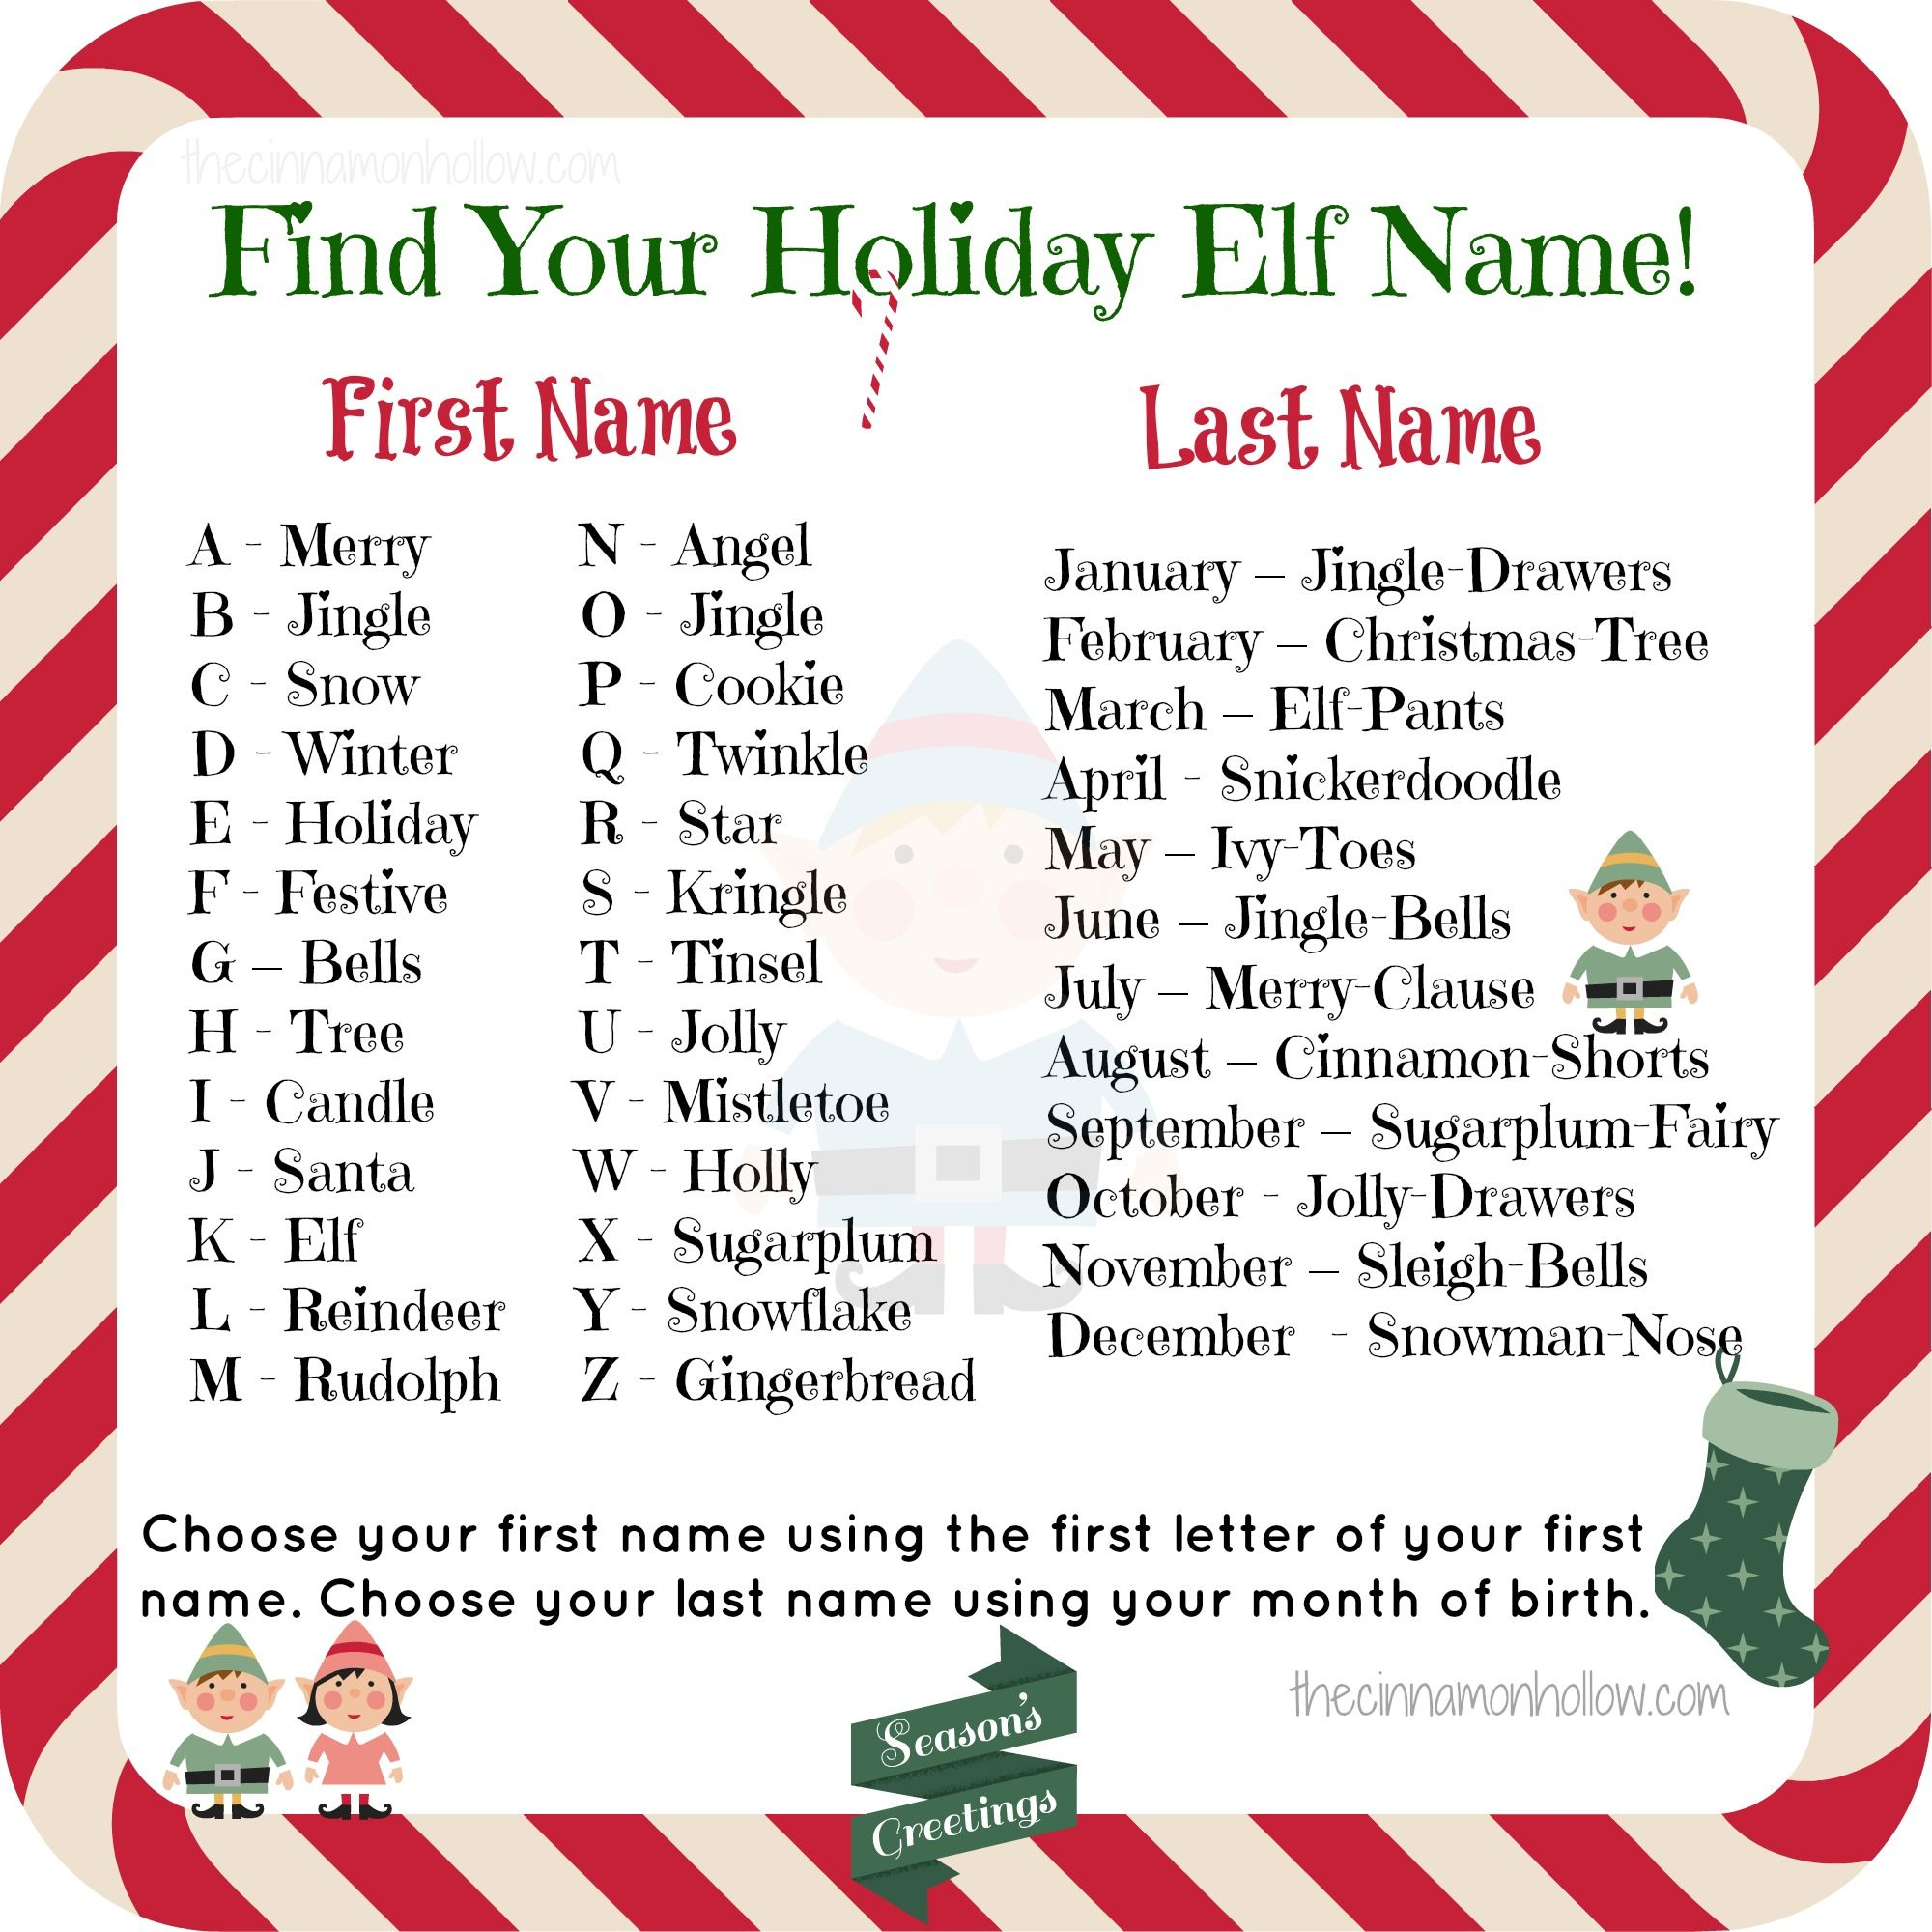 Elf names hentai picture